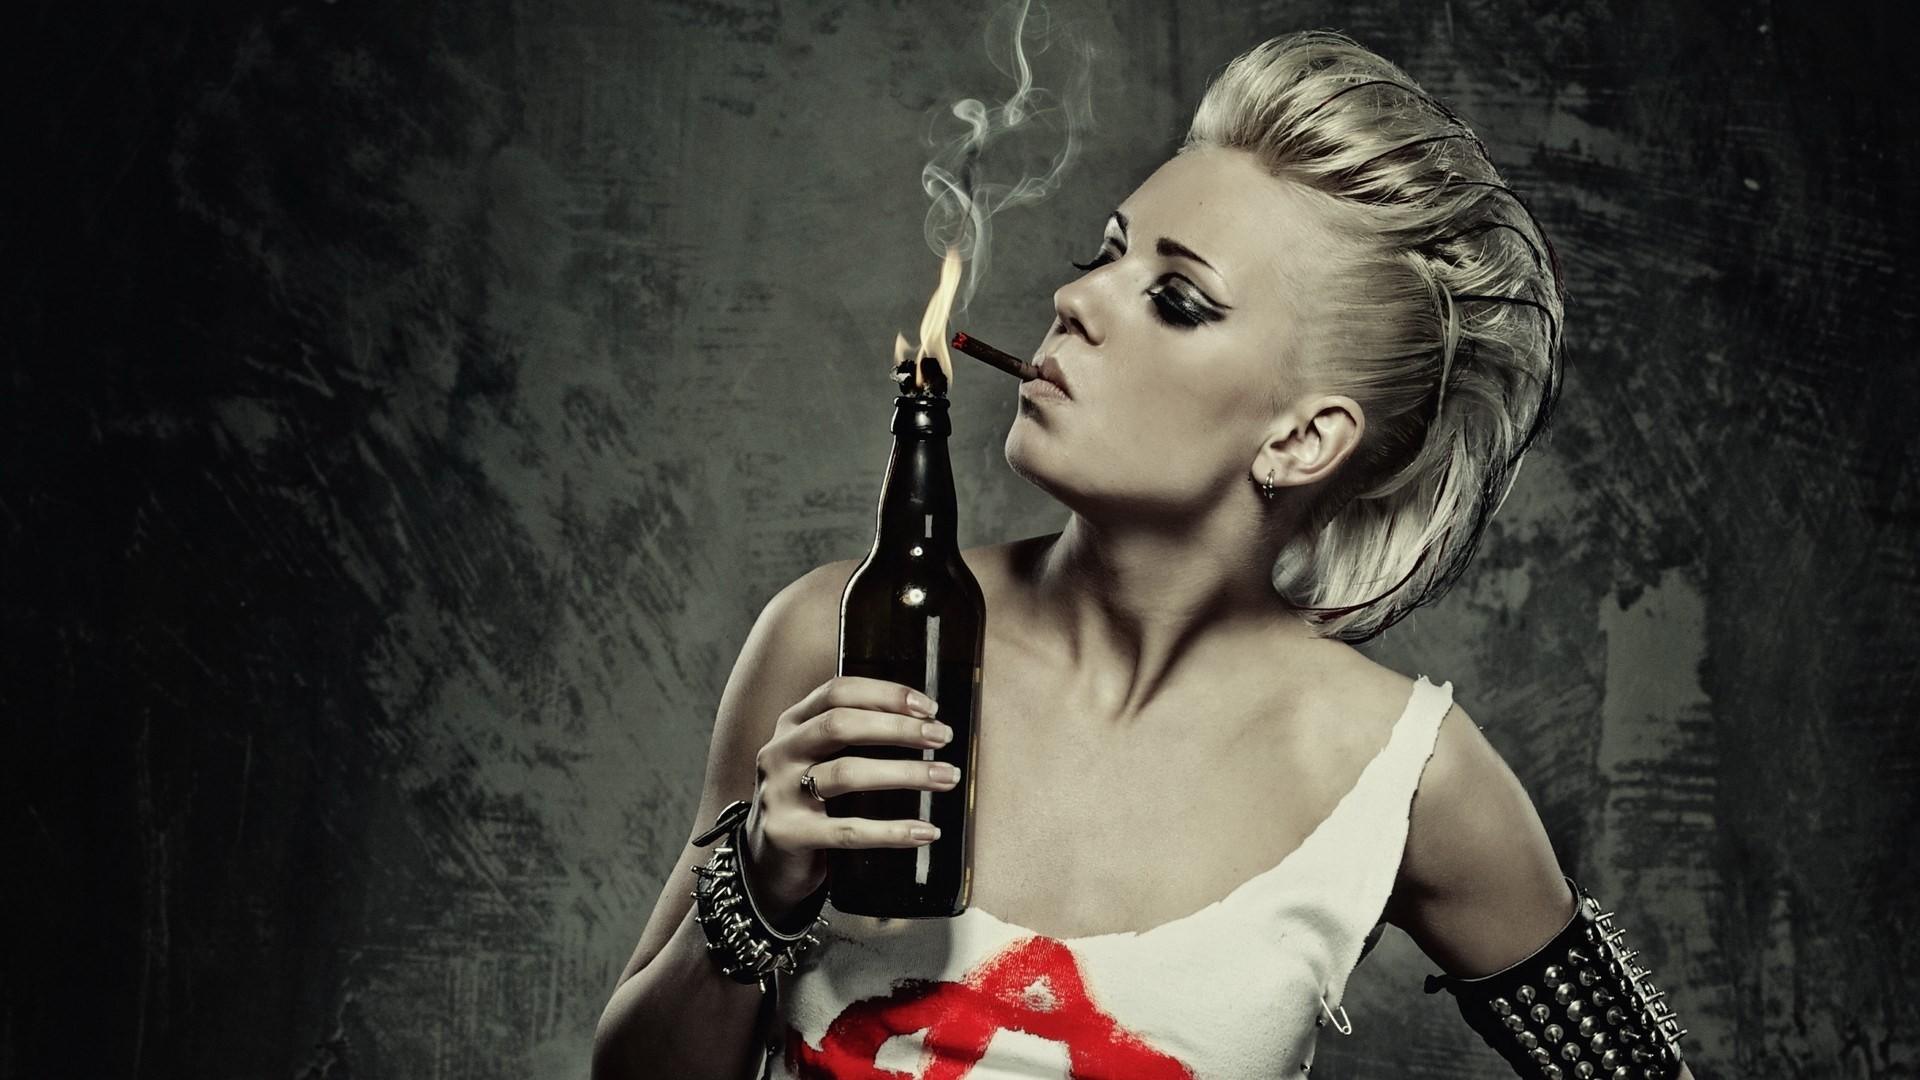 Punk Girl Smoking Molotov Cocktail HD Wallpaper | FreeHDWall.Com | Free HD  Wallpapers for